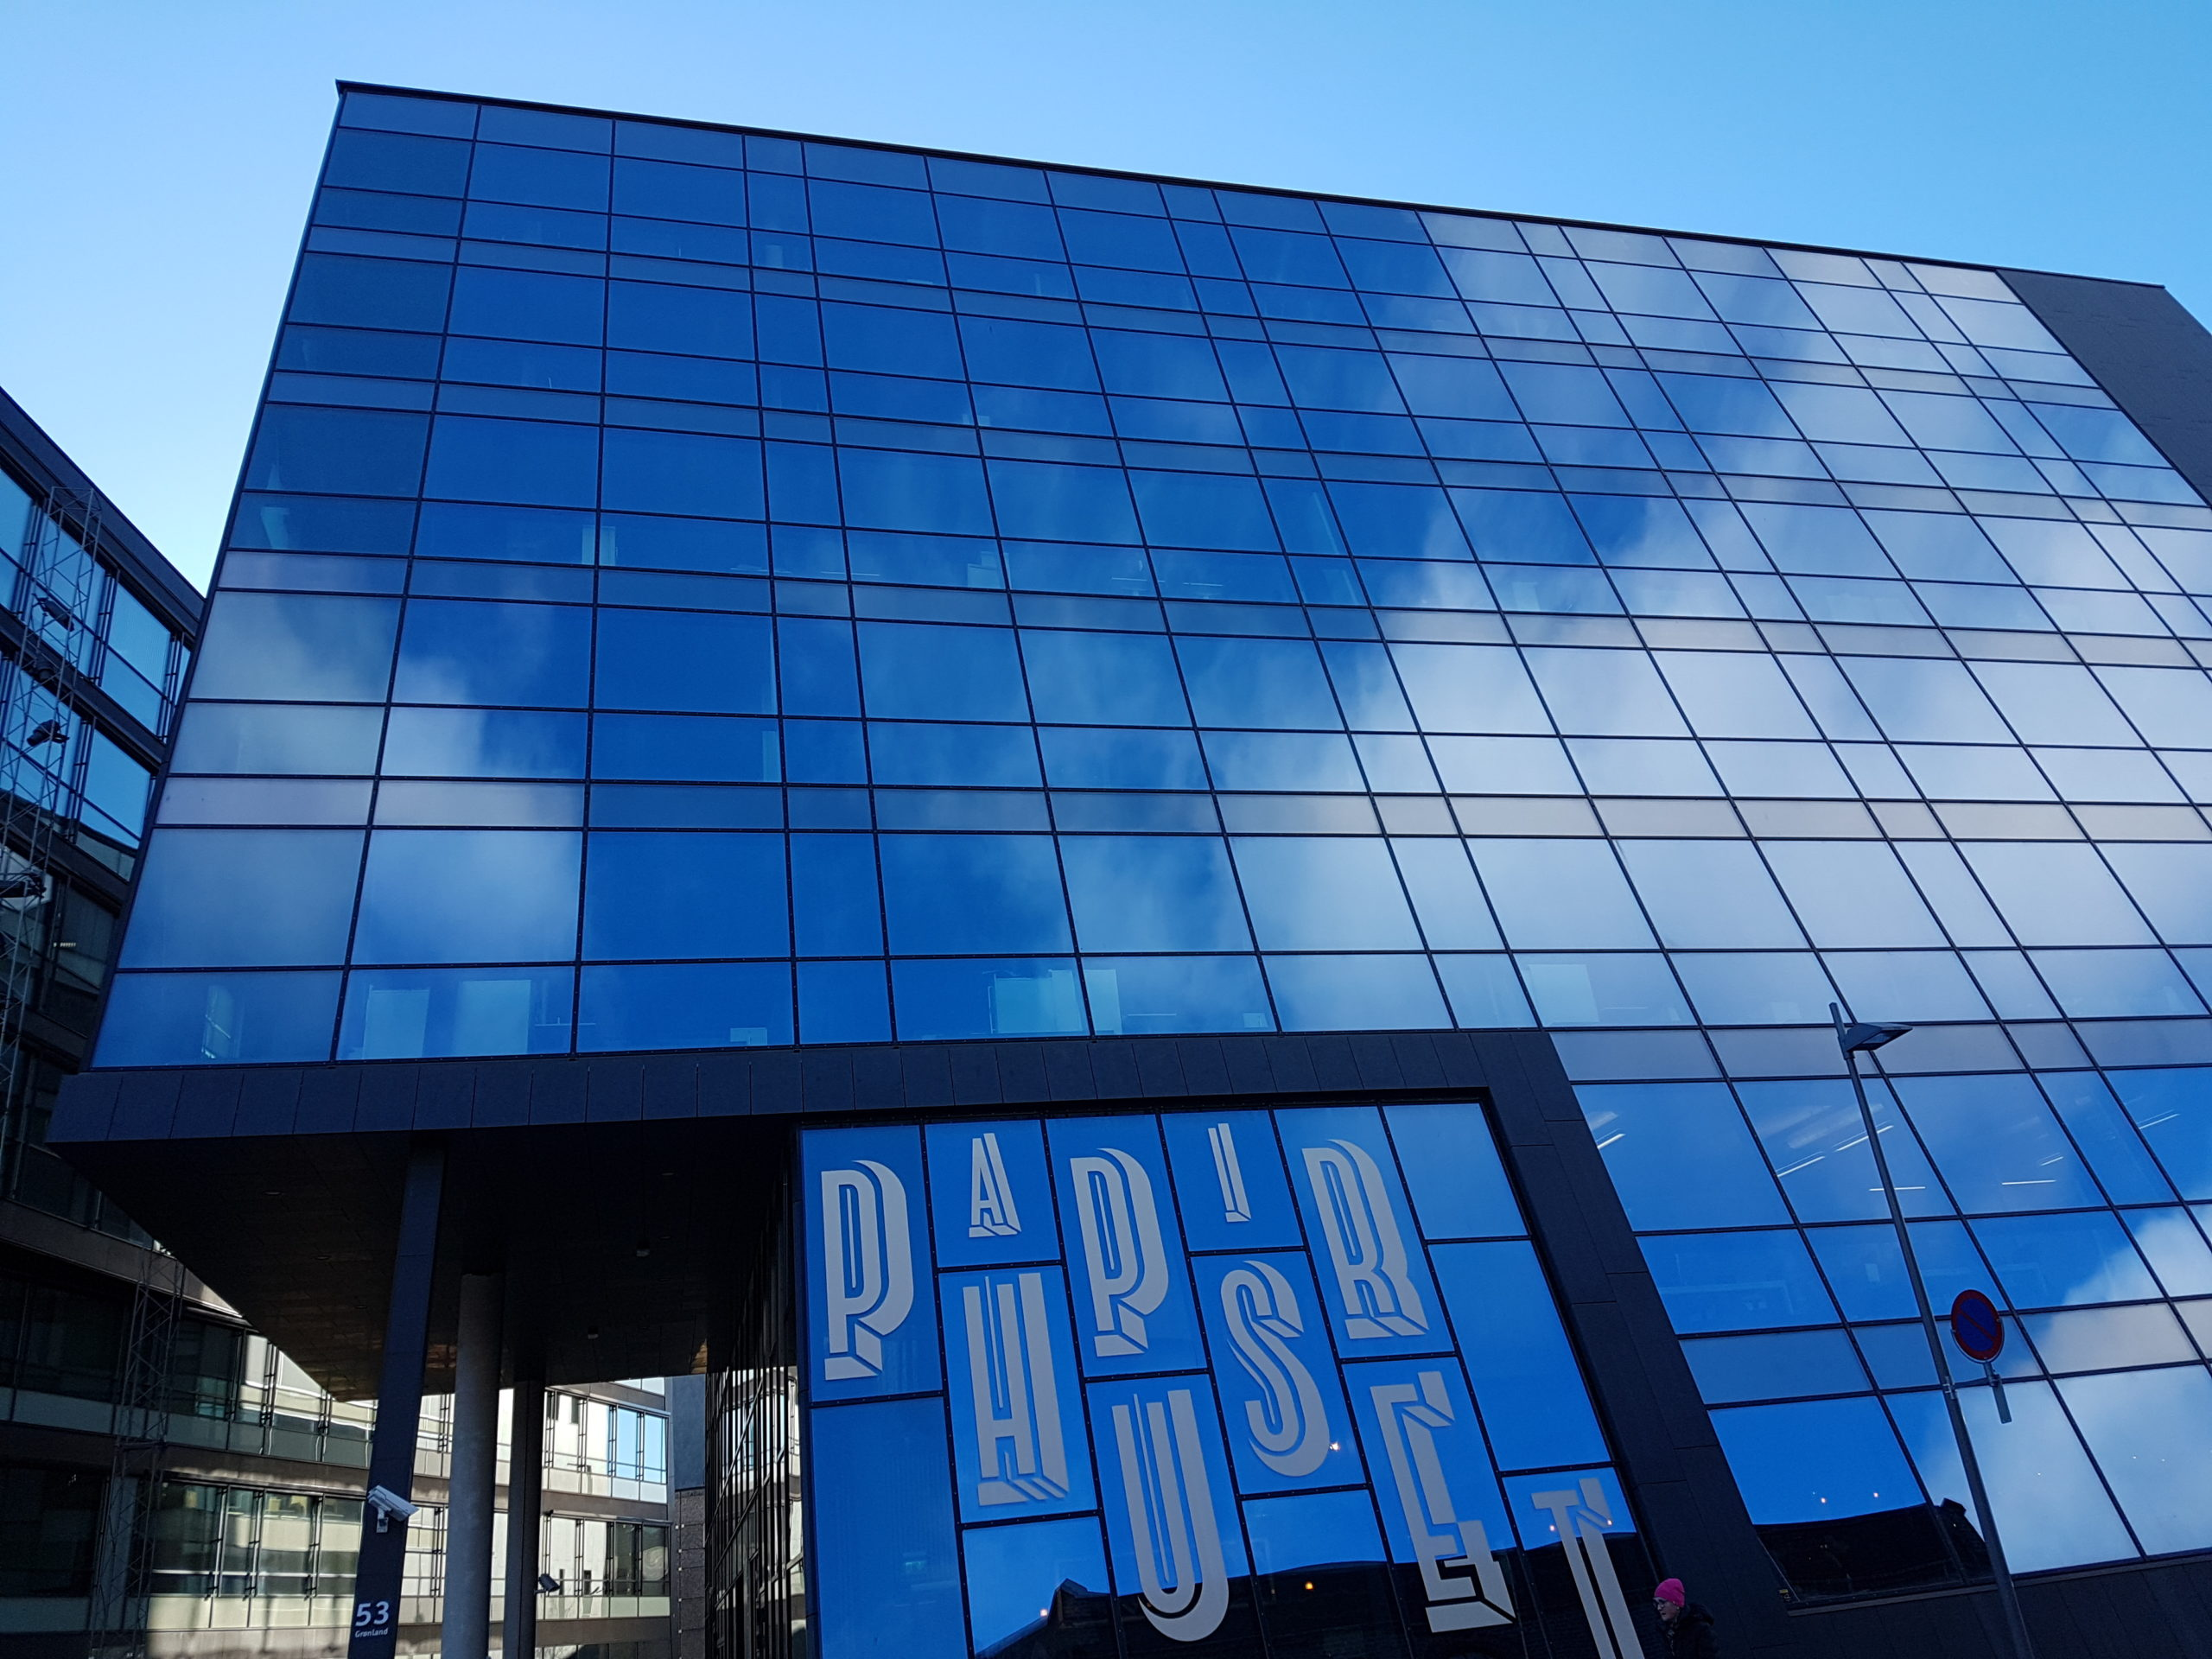 Papirbredden 2 i Drammen